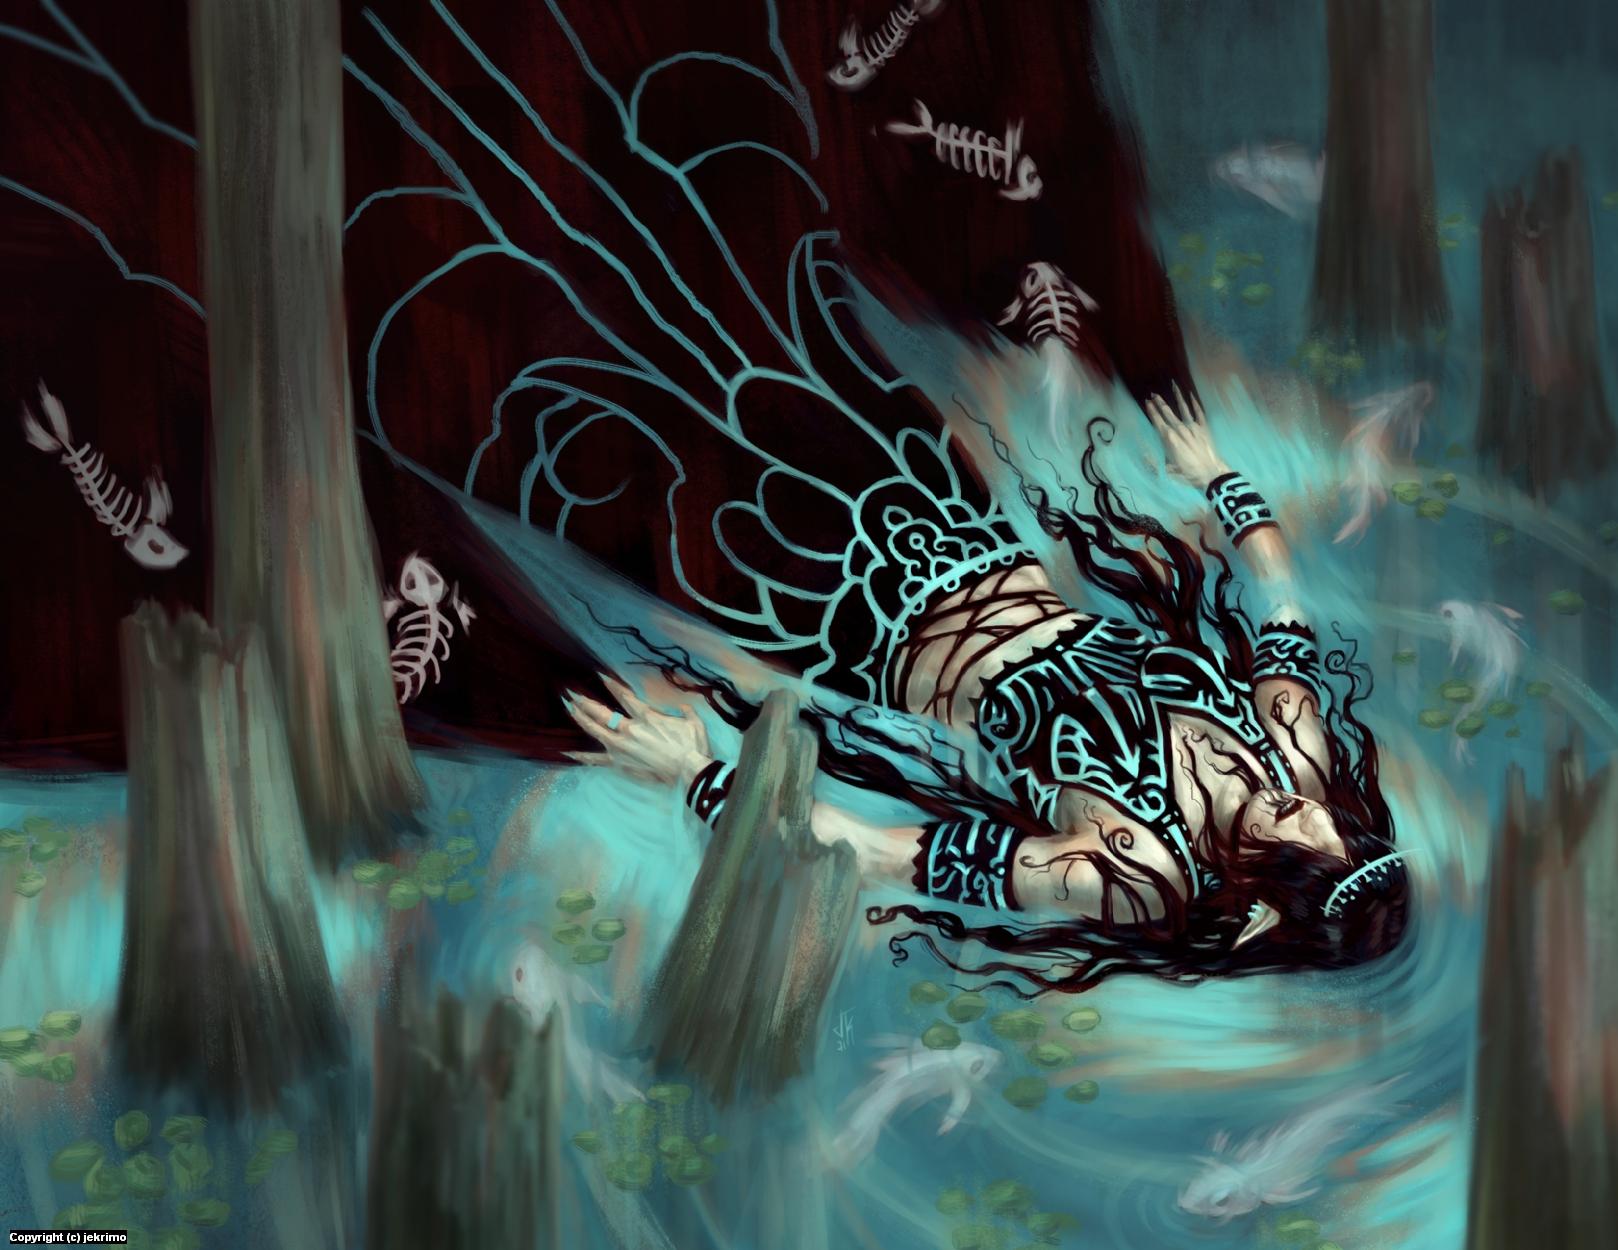 Effluent Crone Artwork by Jeff Kristian